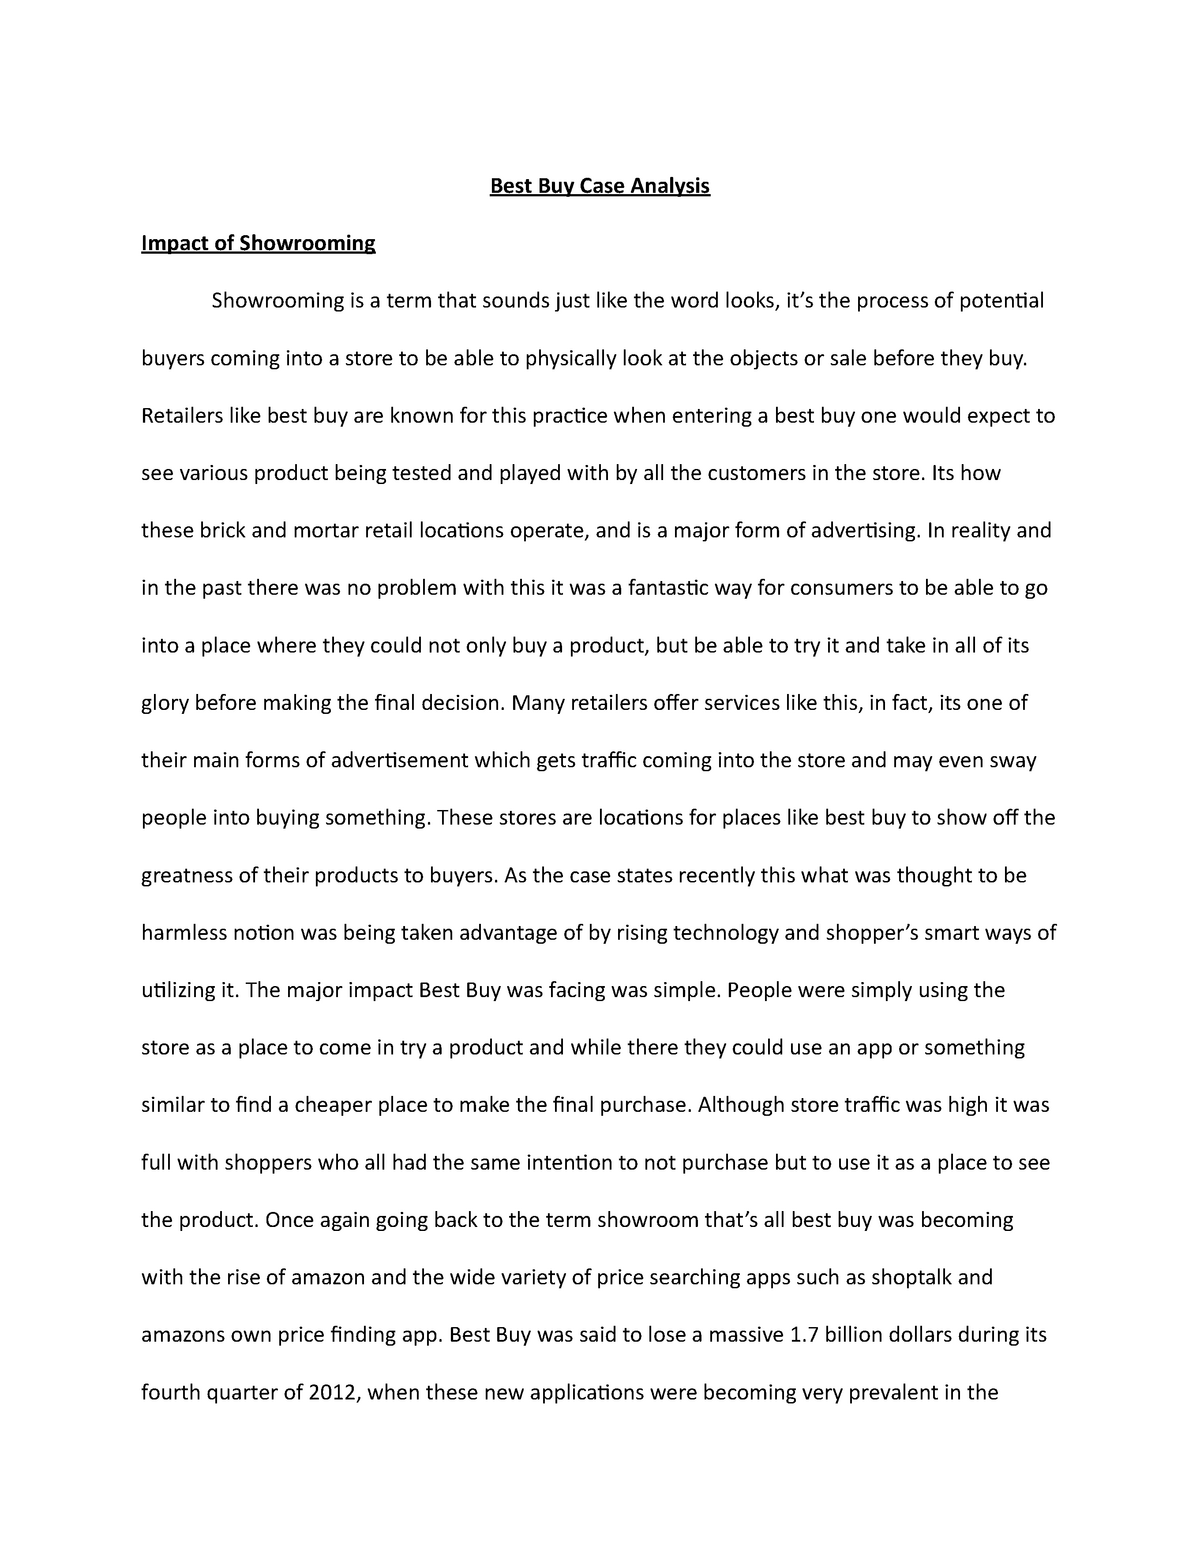 Best Buy Case Study Essays